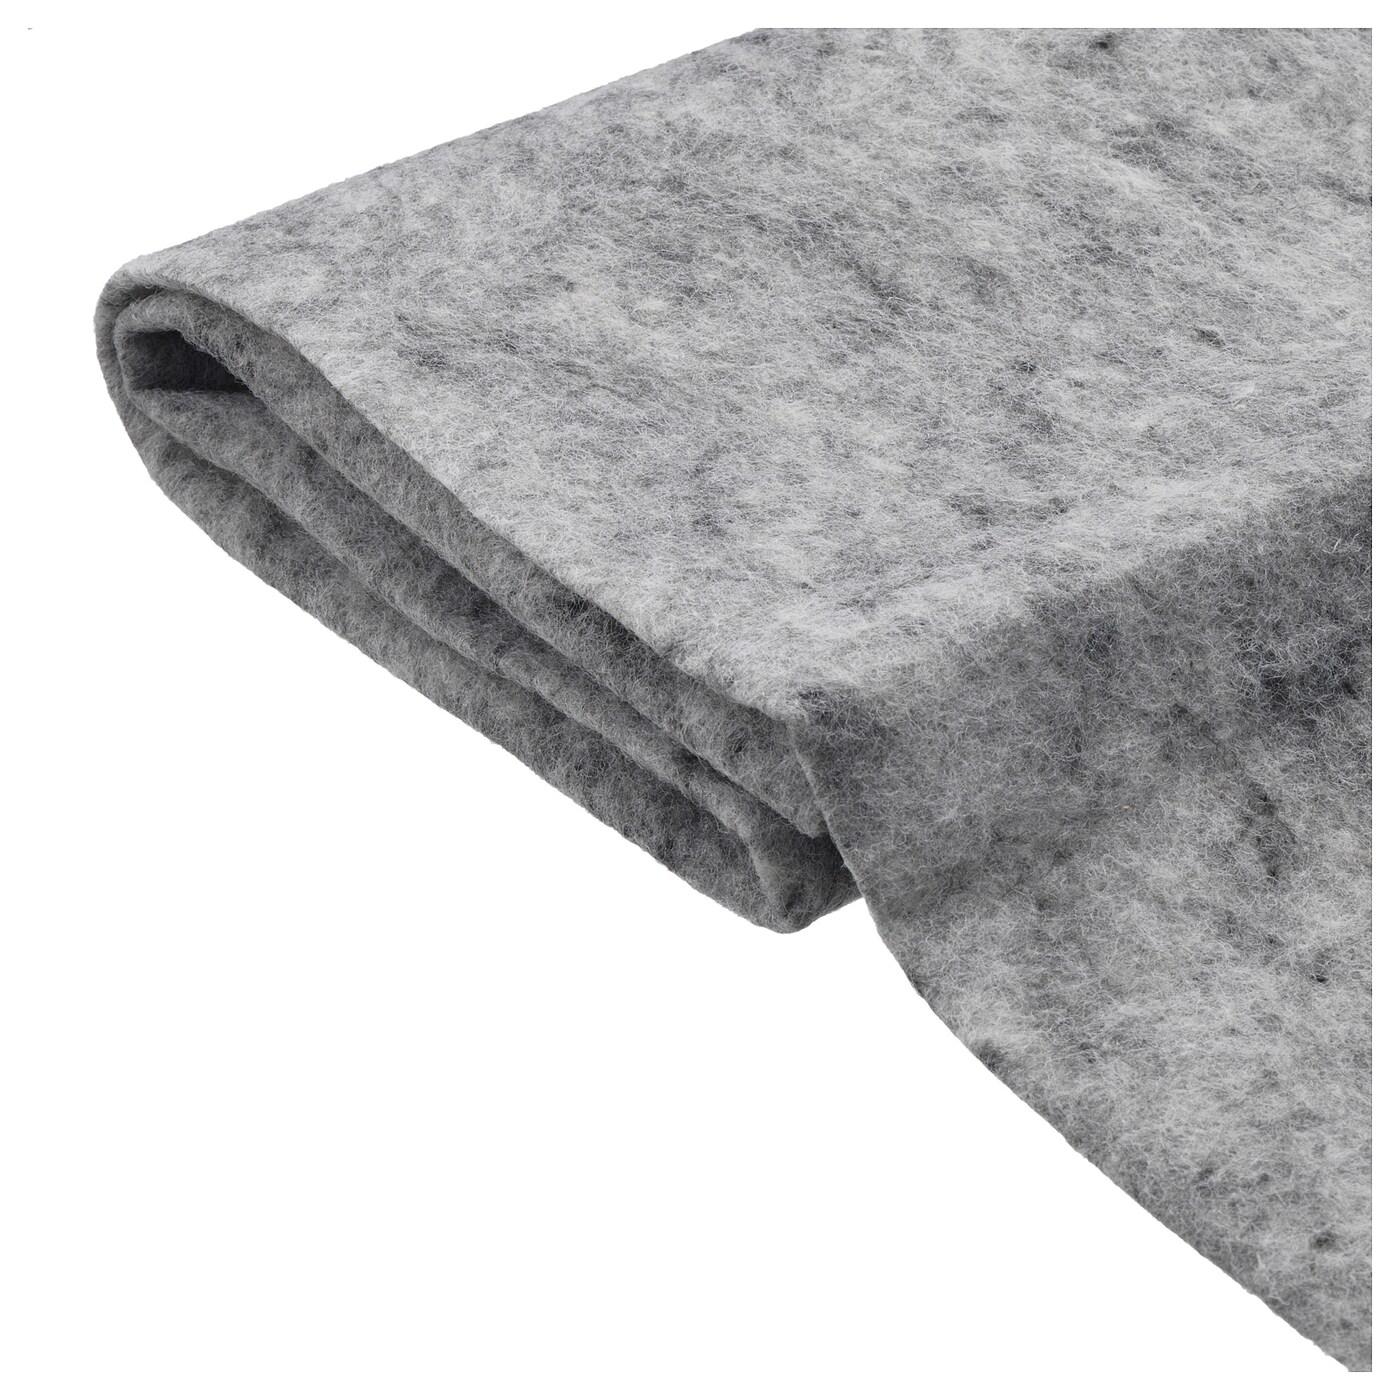 Stopp filt protector antideslizante 65 x 125 cm ikea - Antideslizante alfombras ikea ...